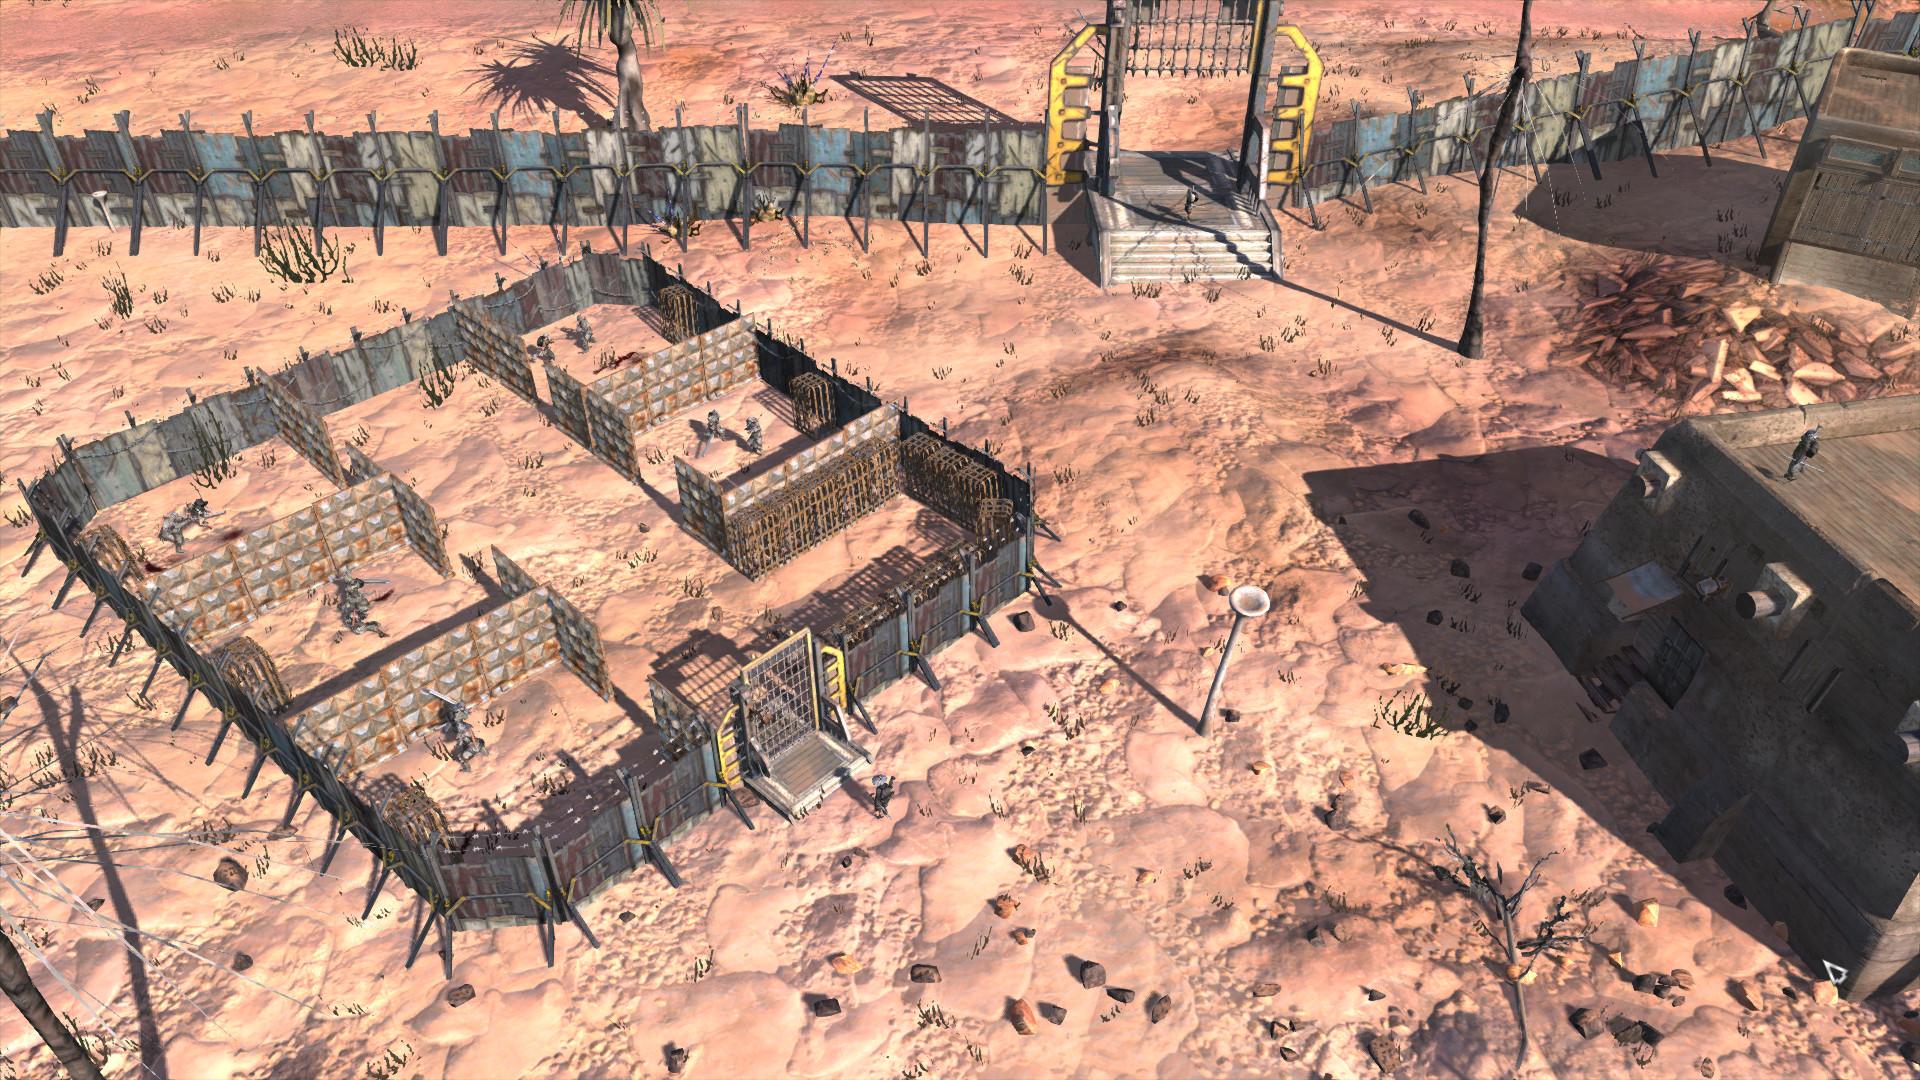 Small Gate and Wall / Небольшие ворота и стены (RU)